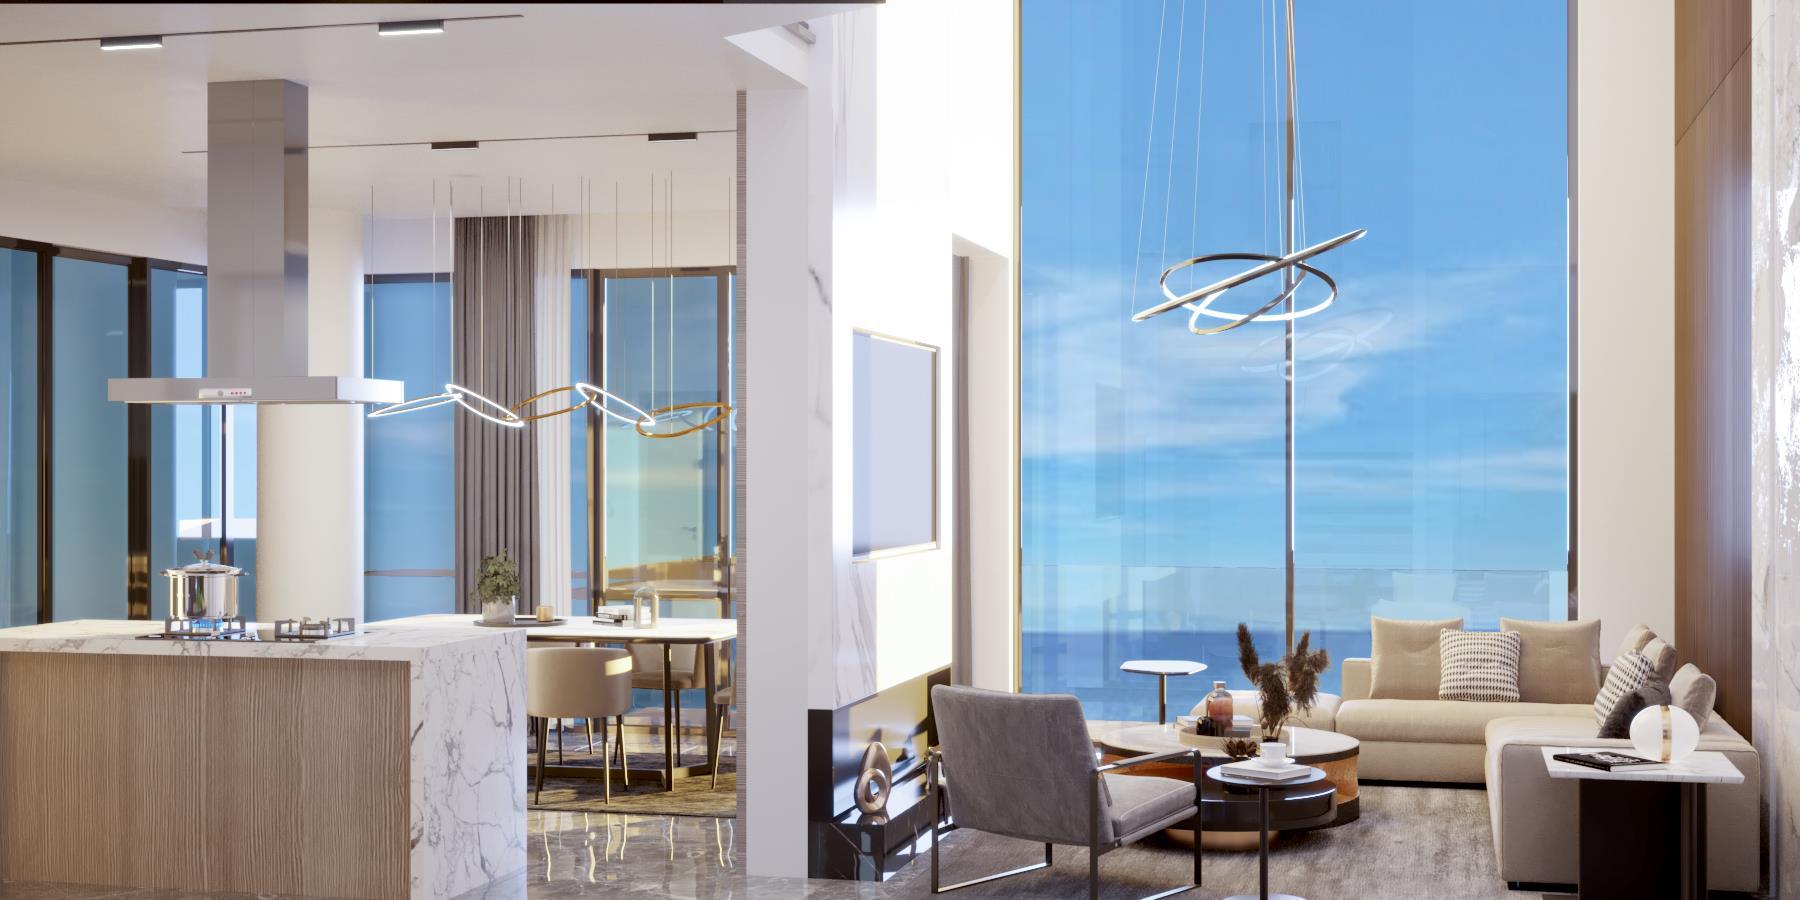 Luxury 3 bedroom resort-style loft apartment